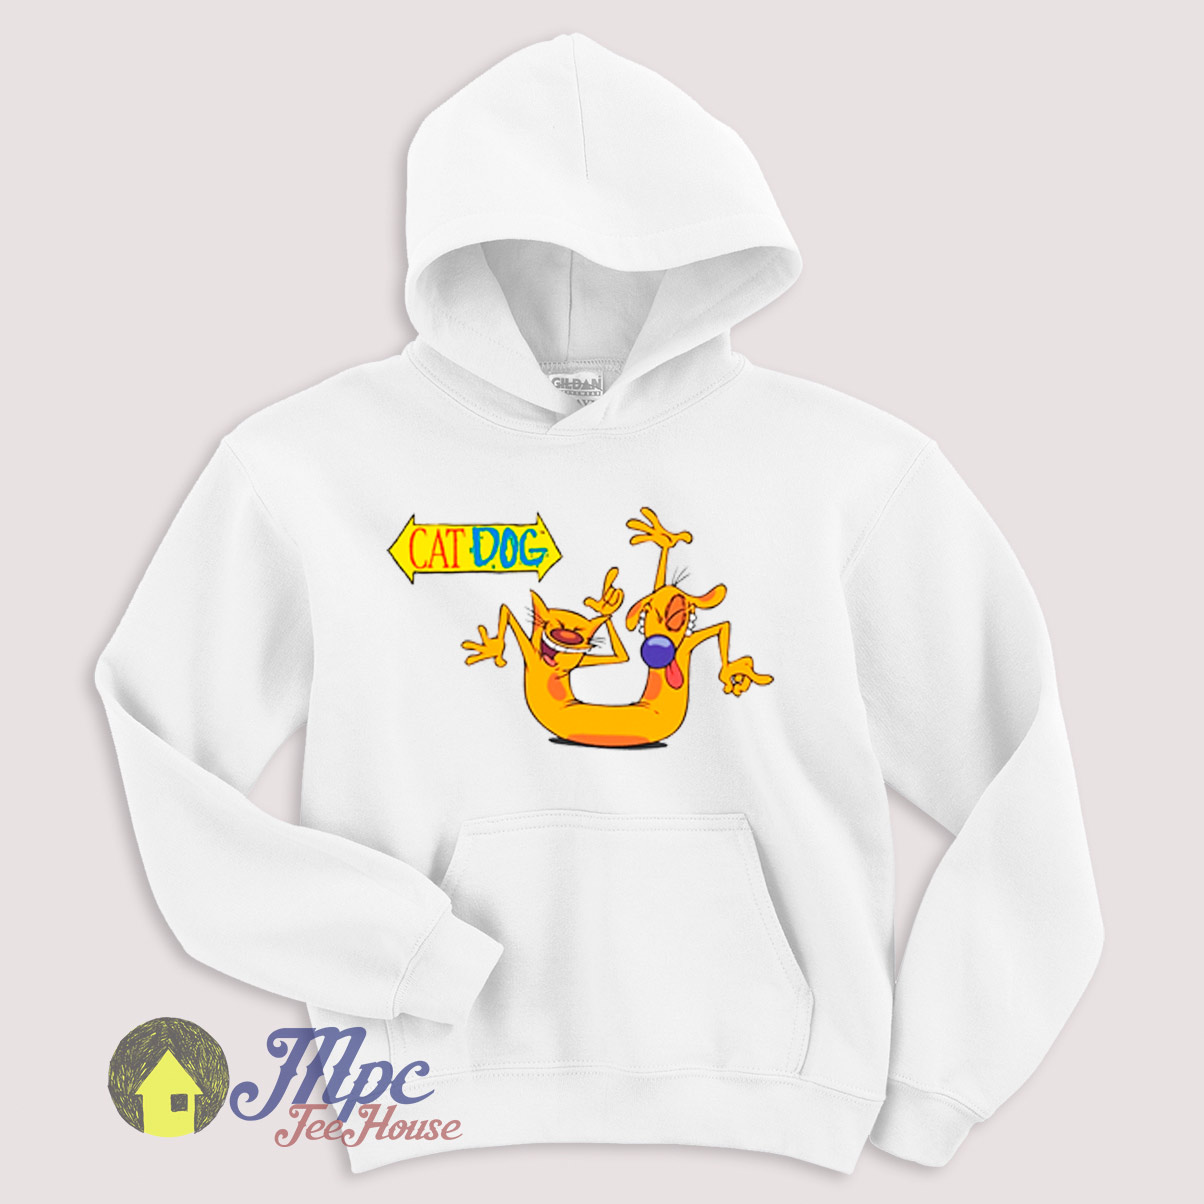 Cartoon character hoodies